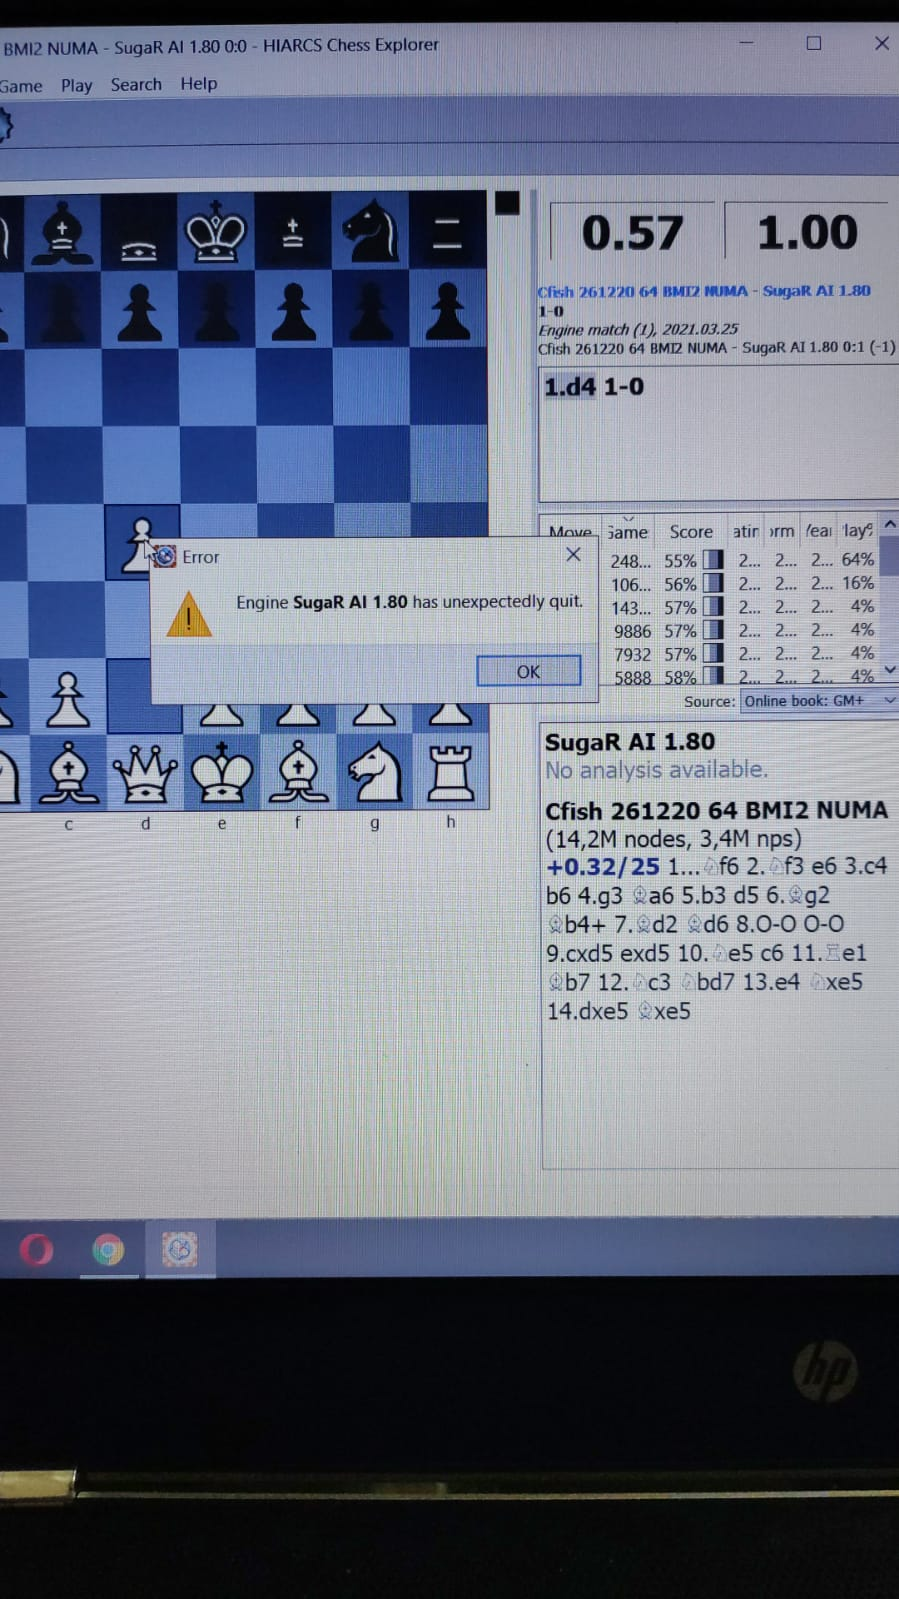 SugaR AI 1.80 Whatsa10